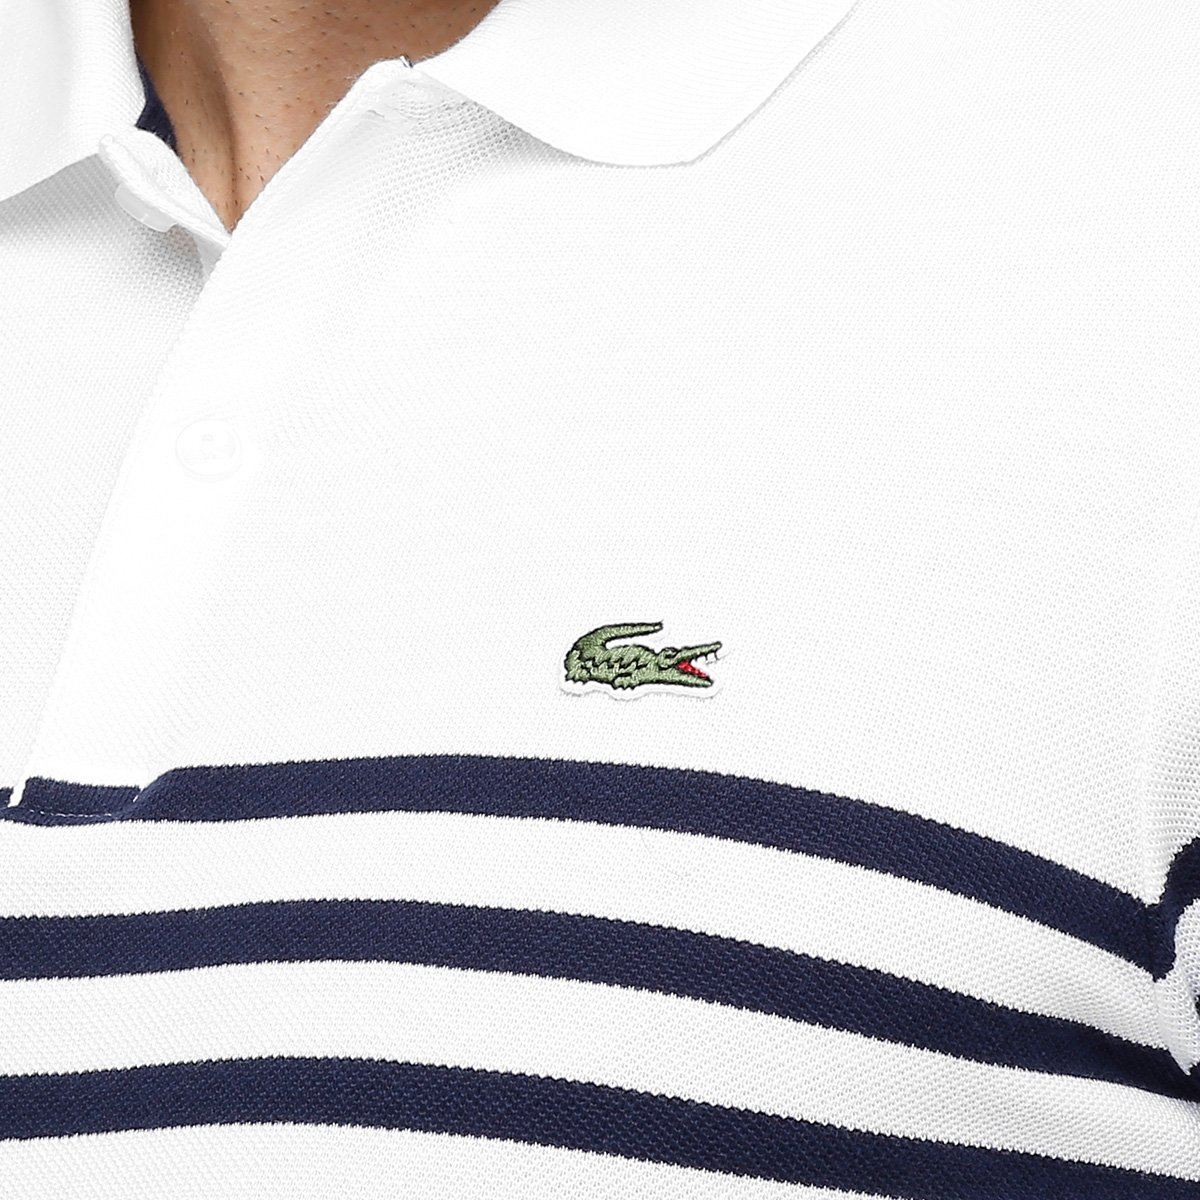 Camisas Polo Lacoste live Piquet listras finas - Compre Agora  bf22df959b2cf